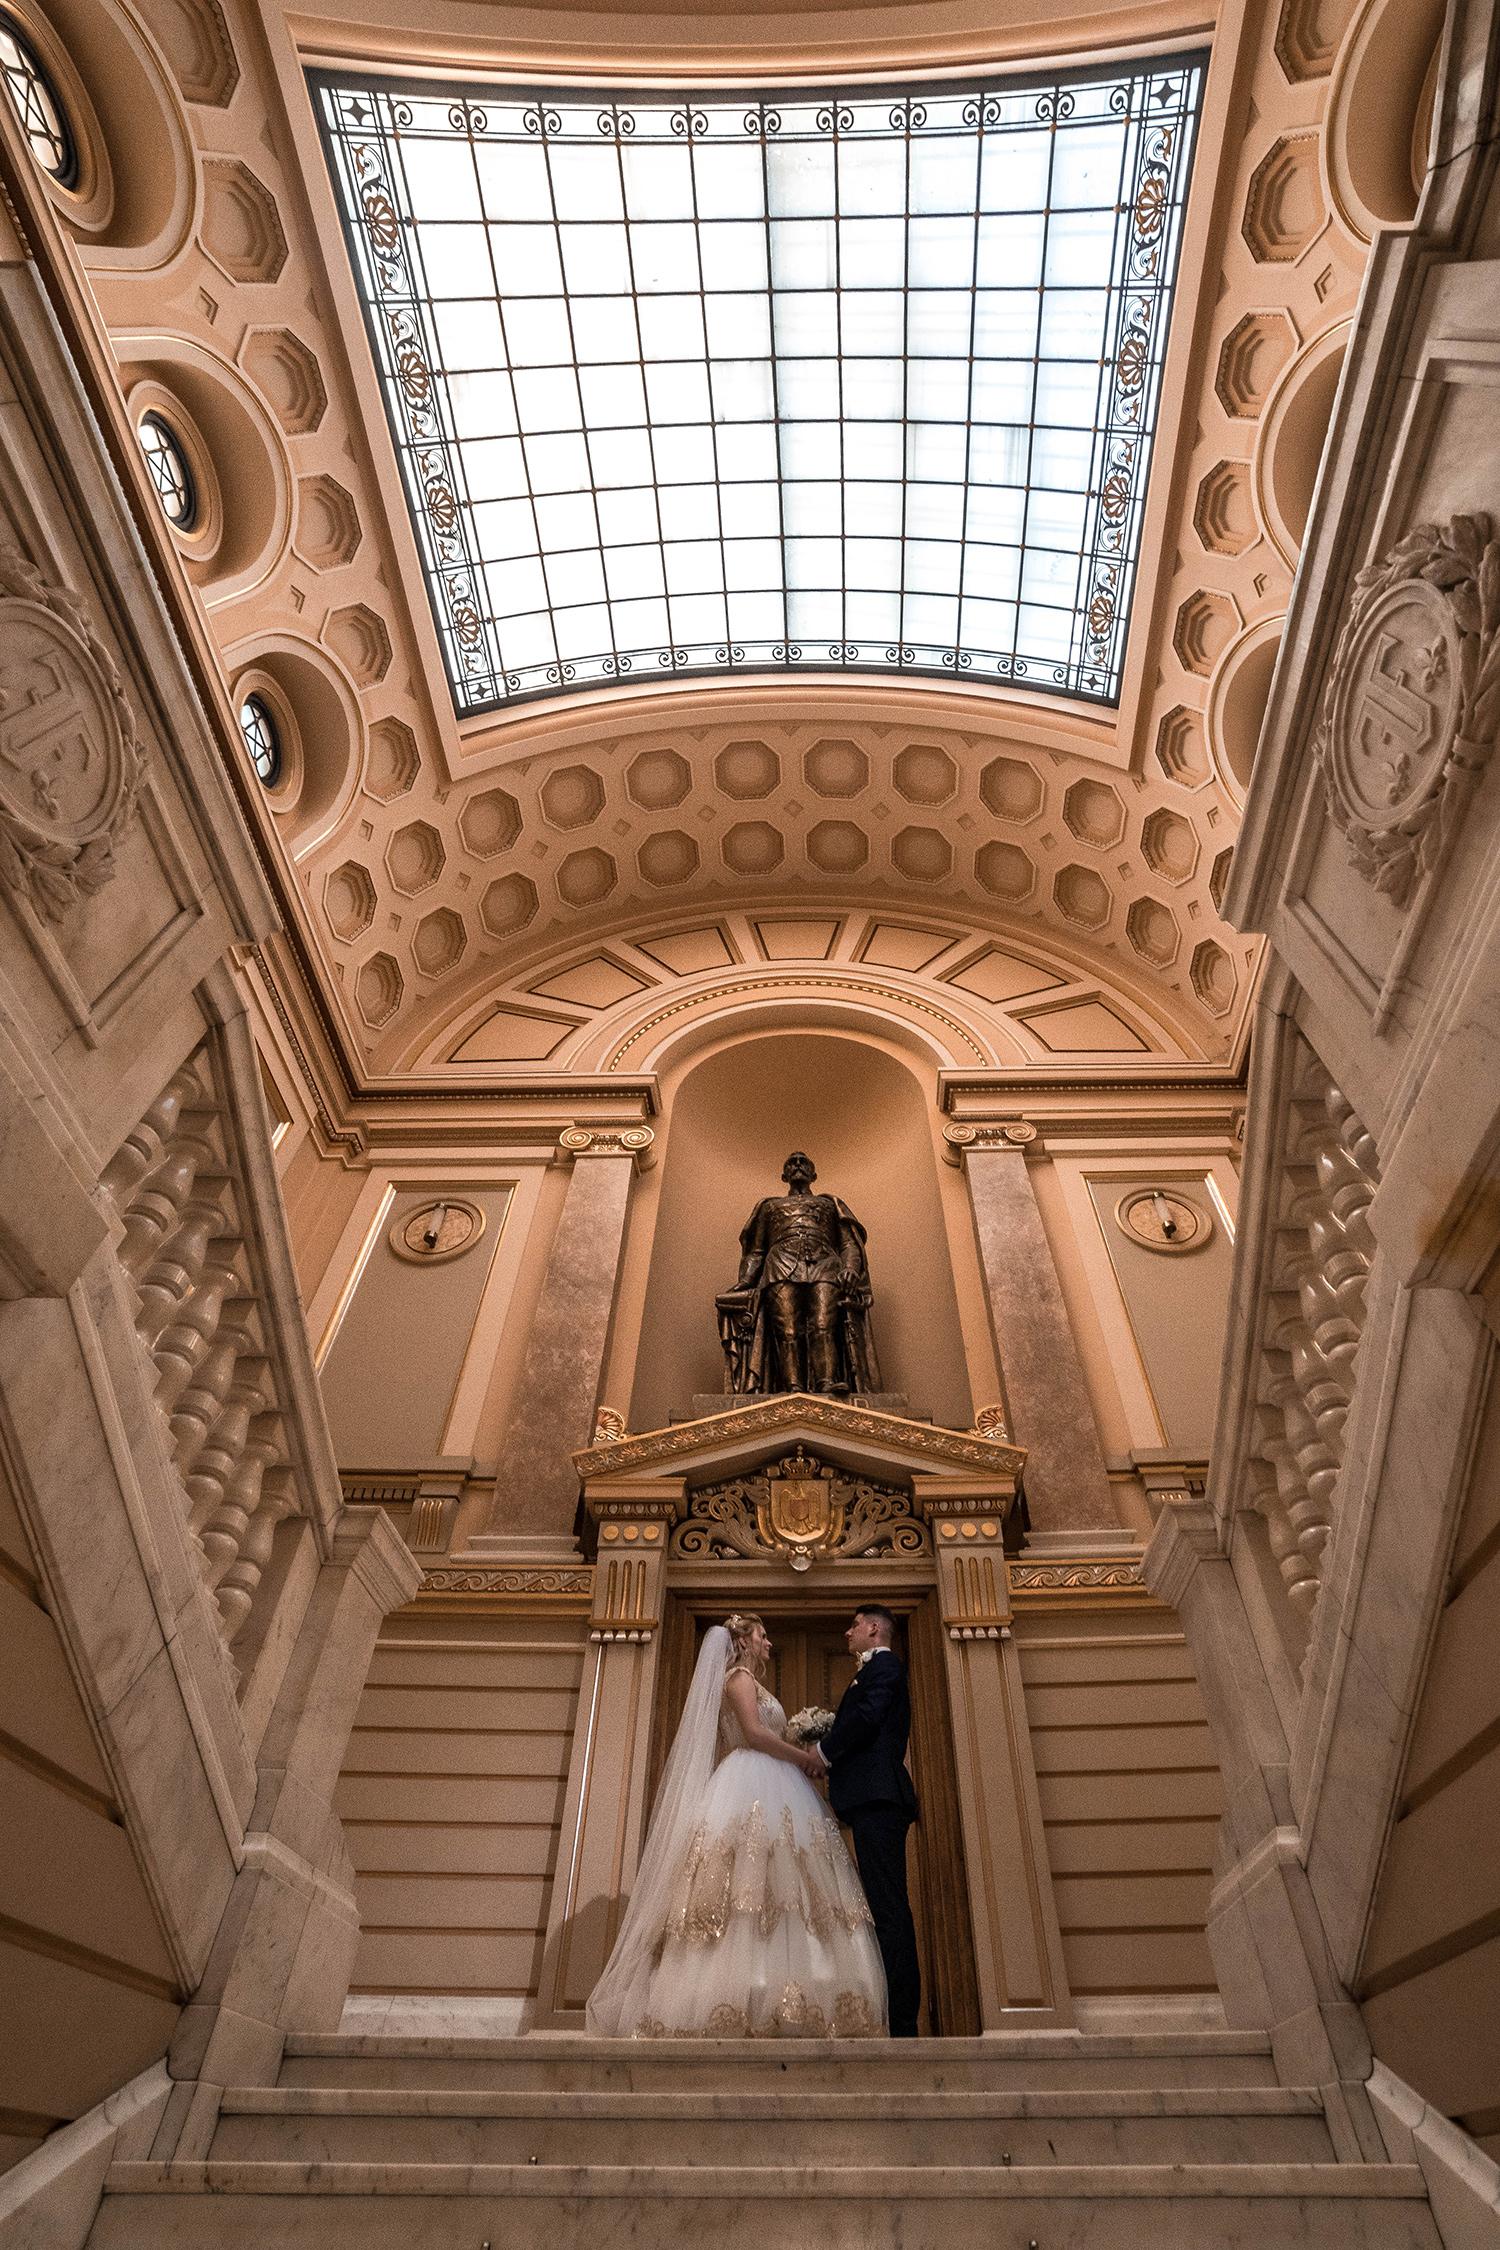 fotograf nunta iasi simona cosmin 06 1.jpg?scale.width=687&scale